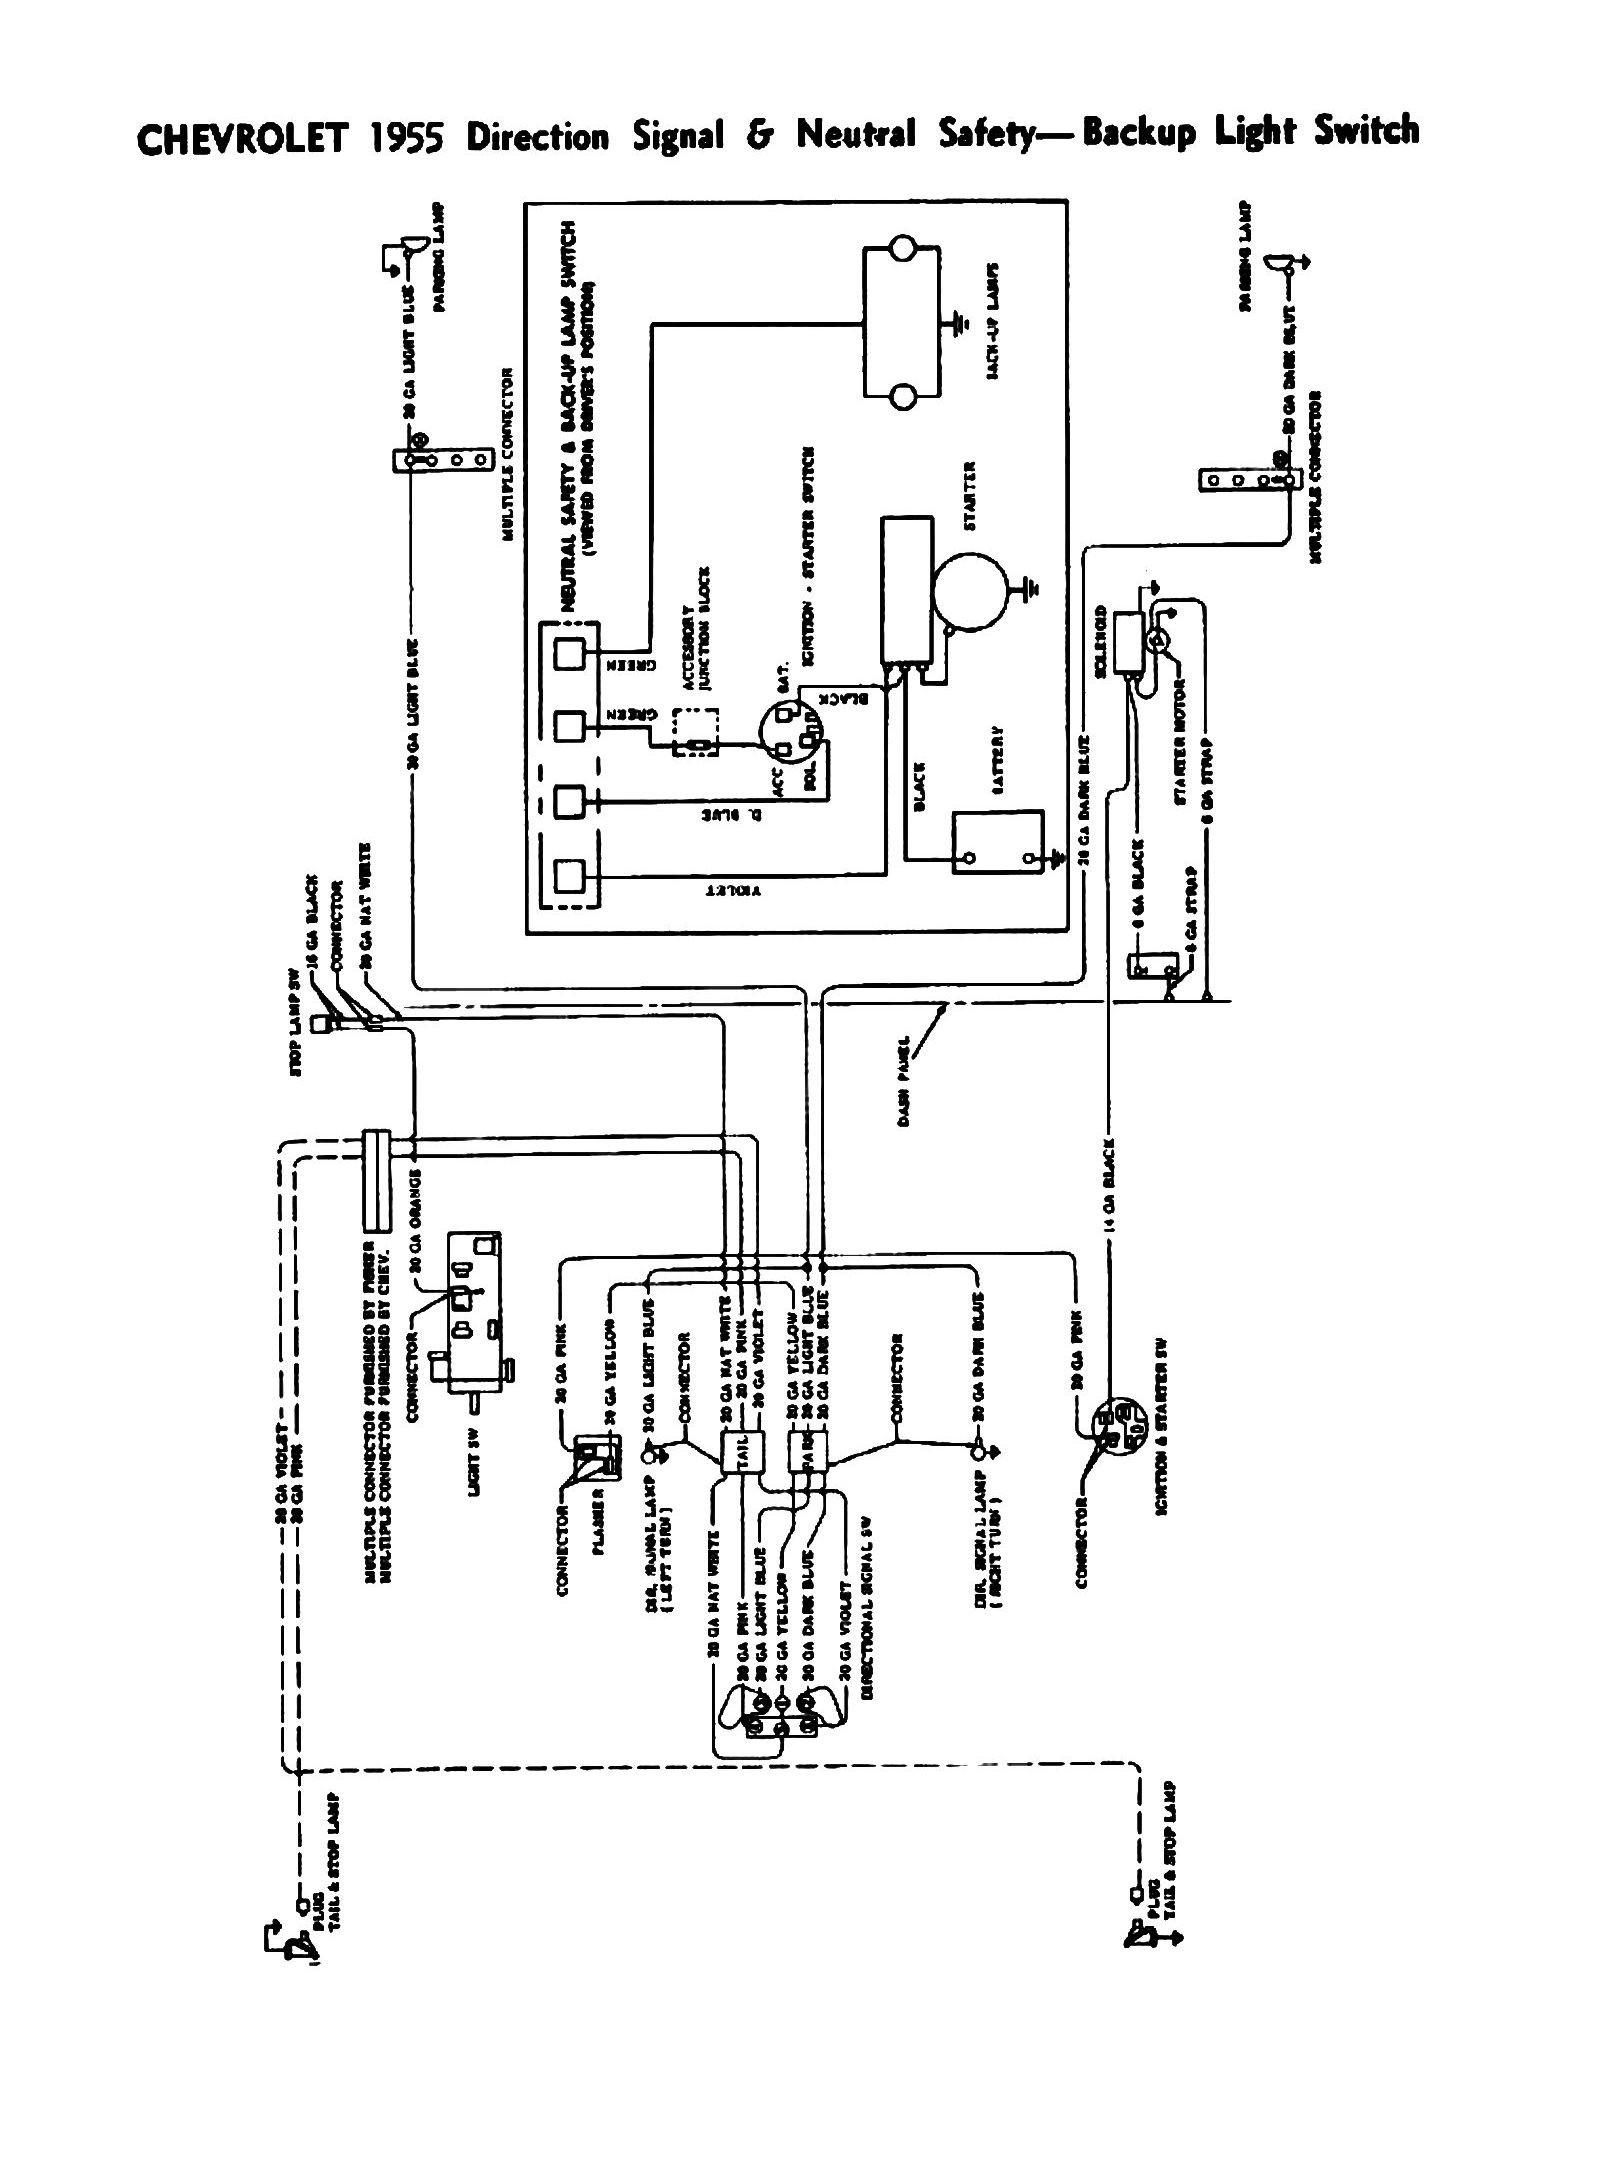 57 chevy starter wiring wiring diagram detailed Chevy Venture Starter Wiring Diagram 1957 chevy truck wiring harness painless wiring diagram detailed 65 chevy truck wiring diagram 57 chevy starter wiring